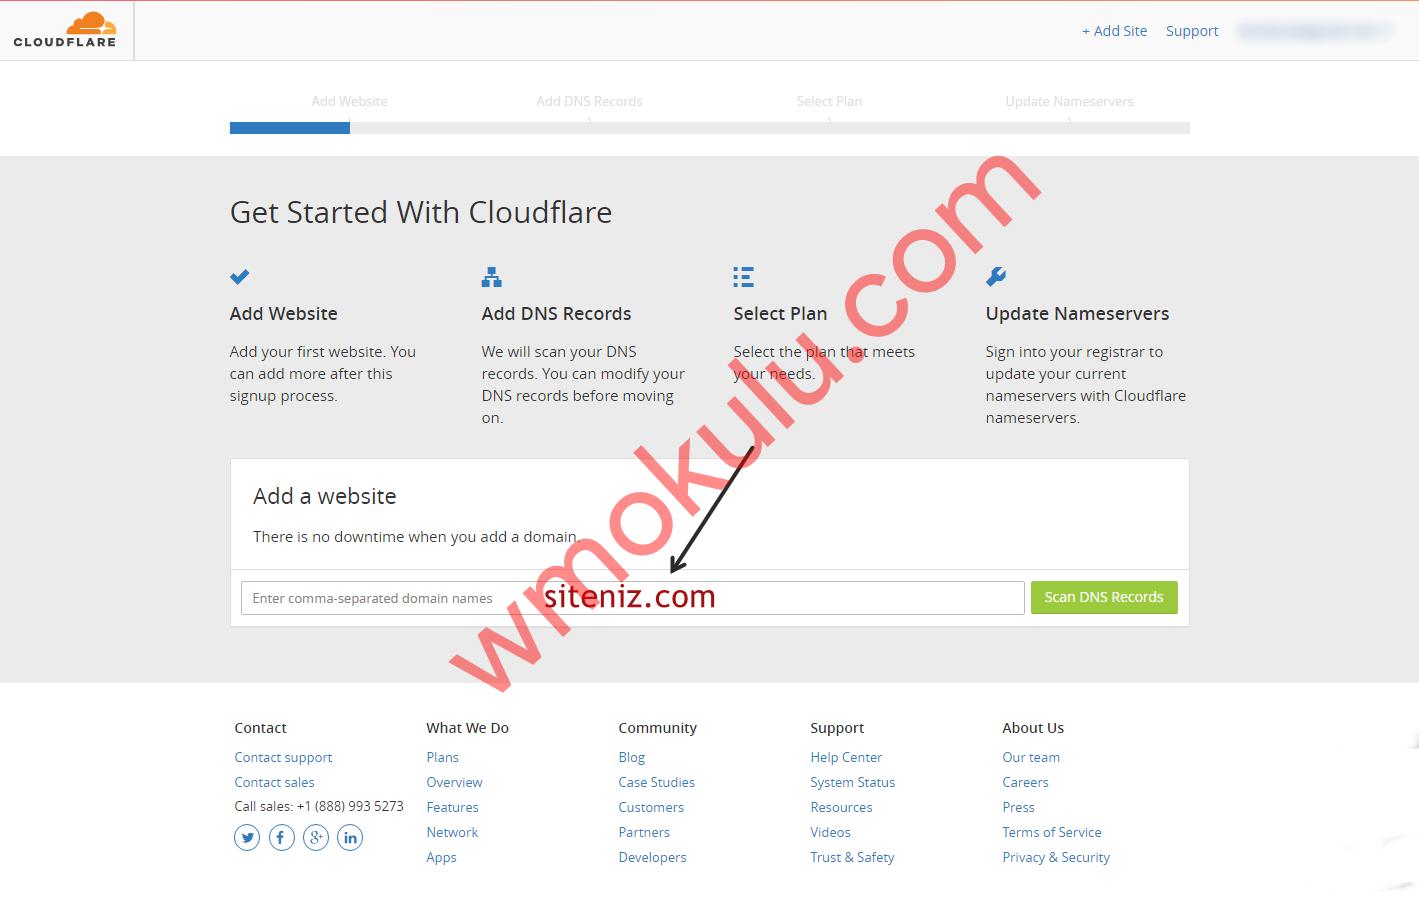 CloudFlare Site Ekleme